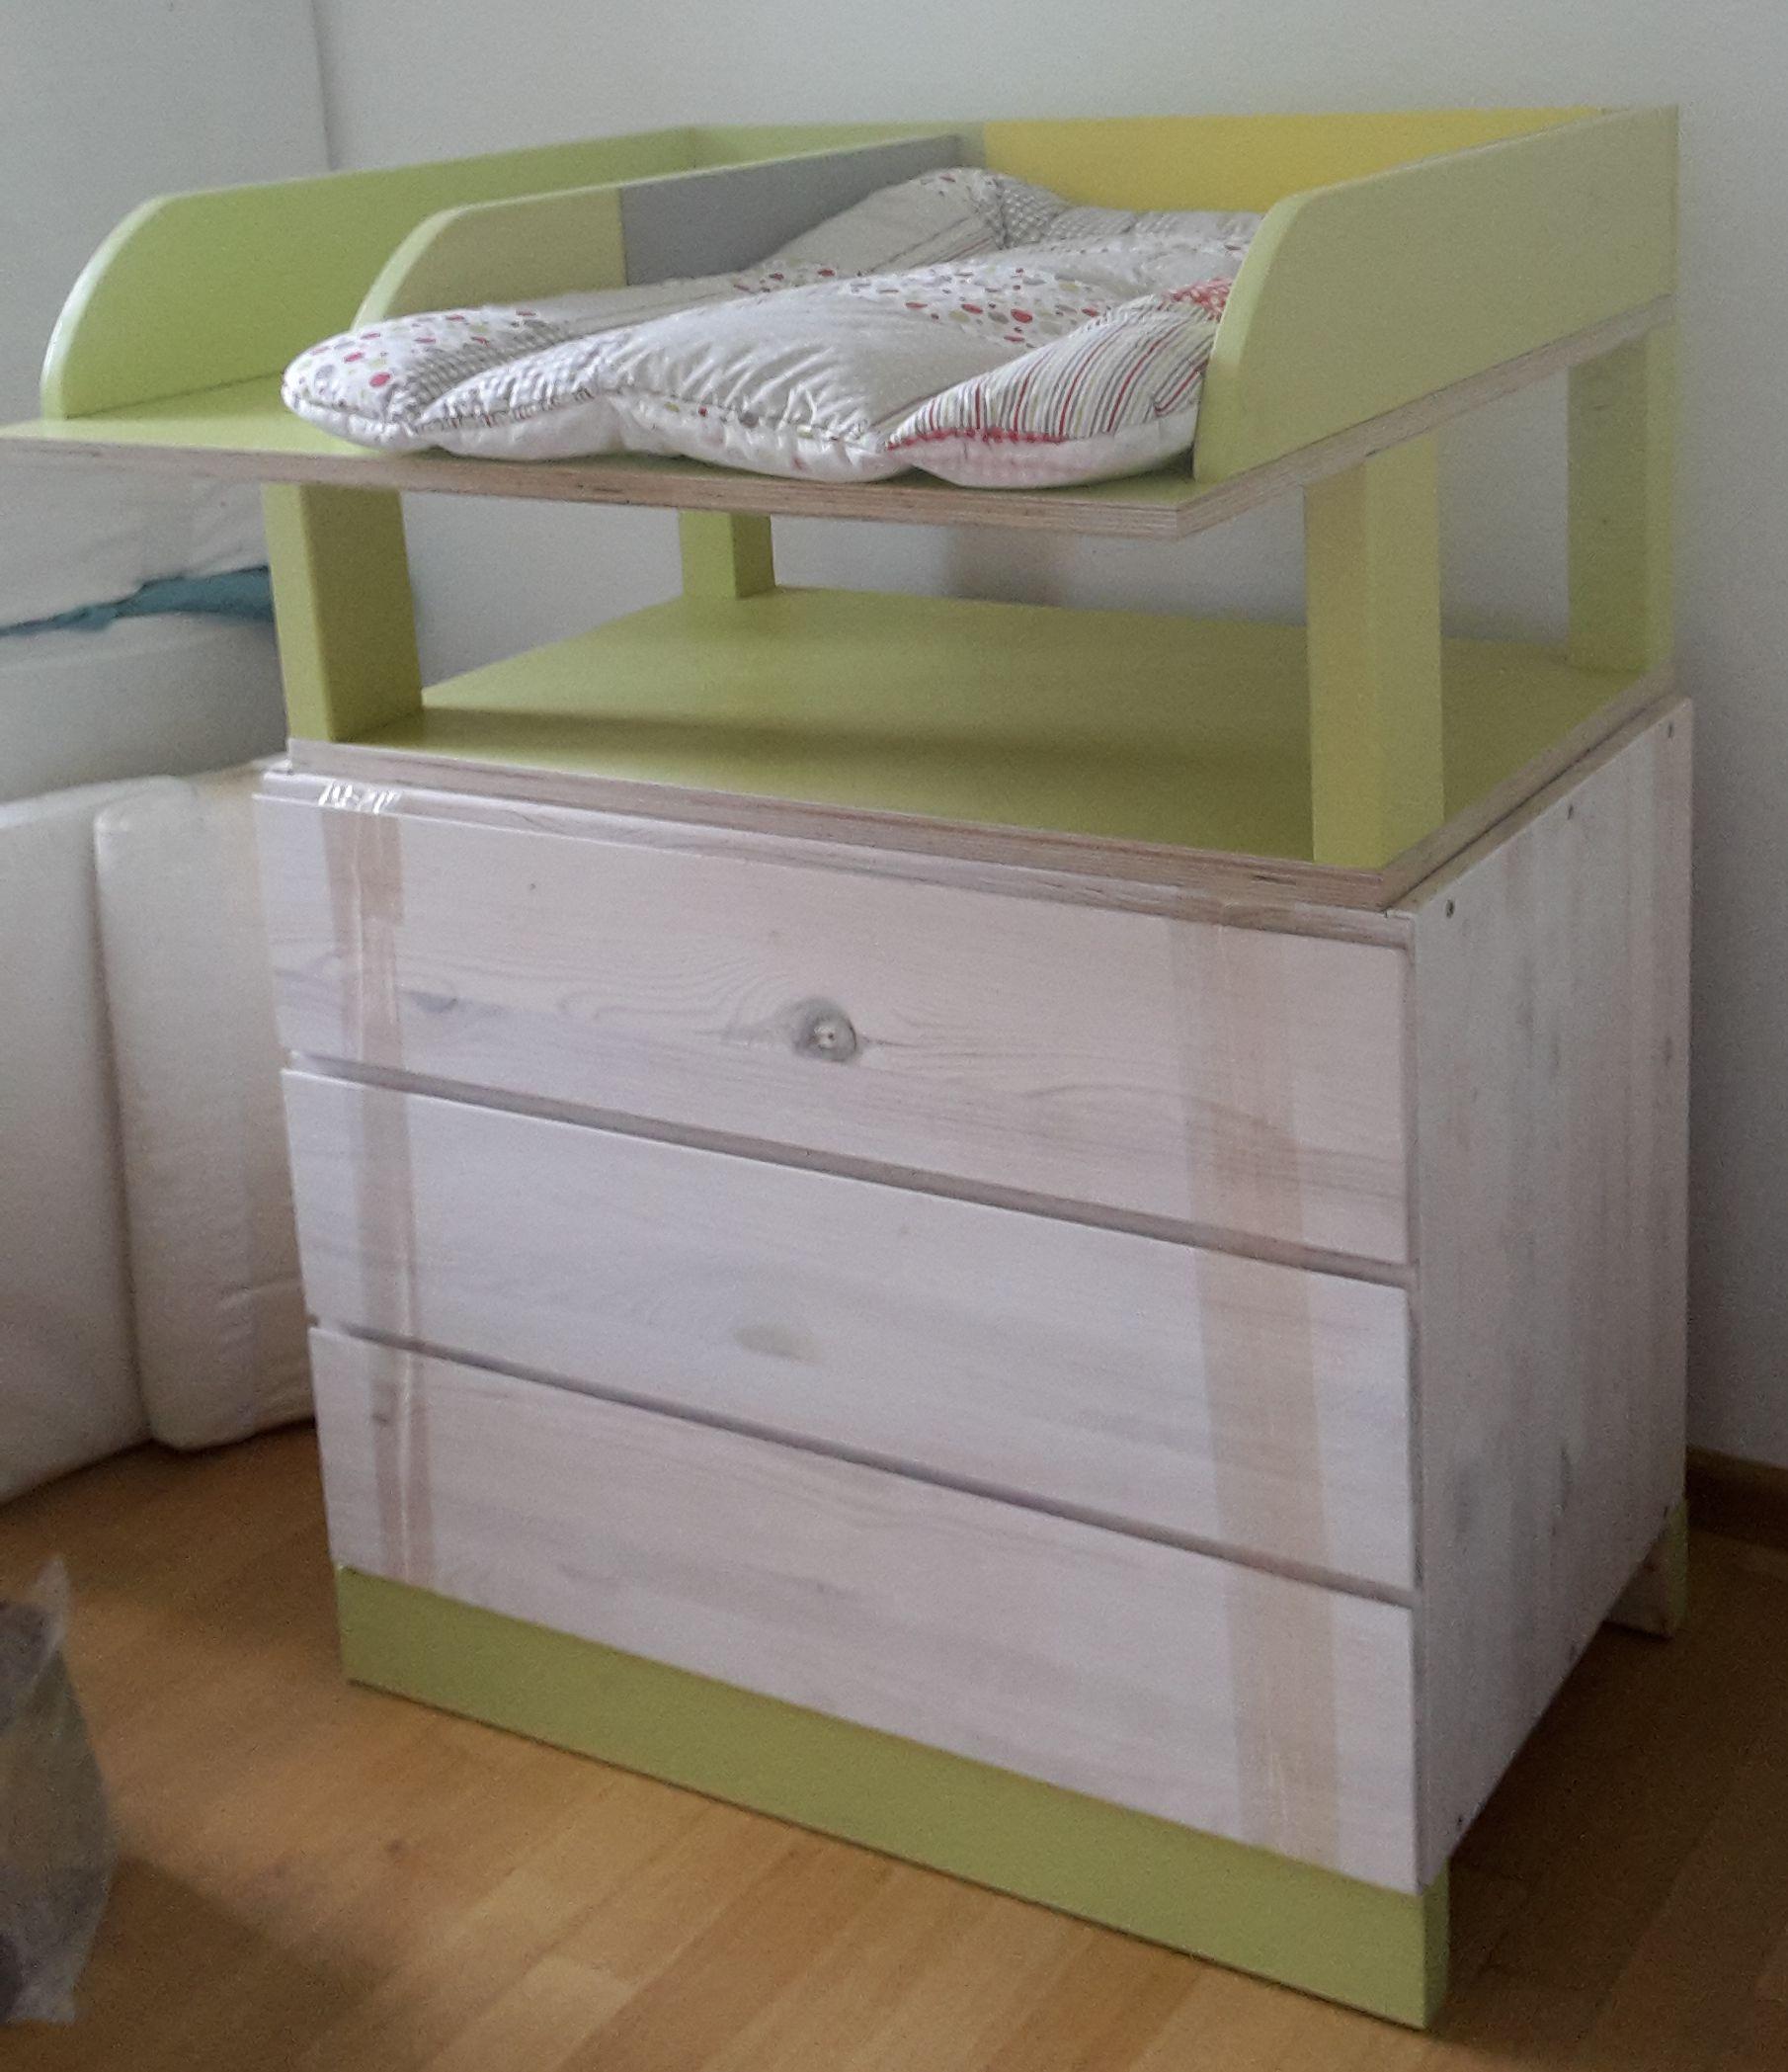 Wickelkommode Ikea wickelkommode ikea diy aufsatz kinderzimmer